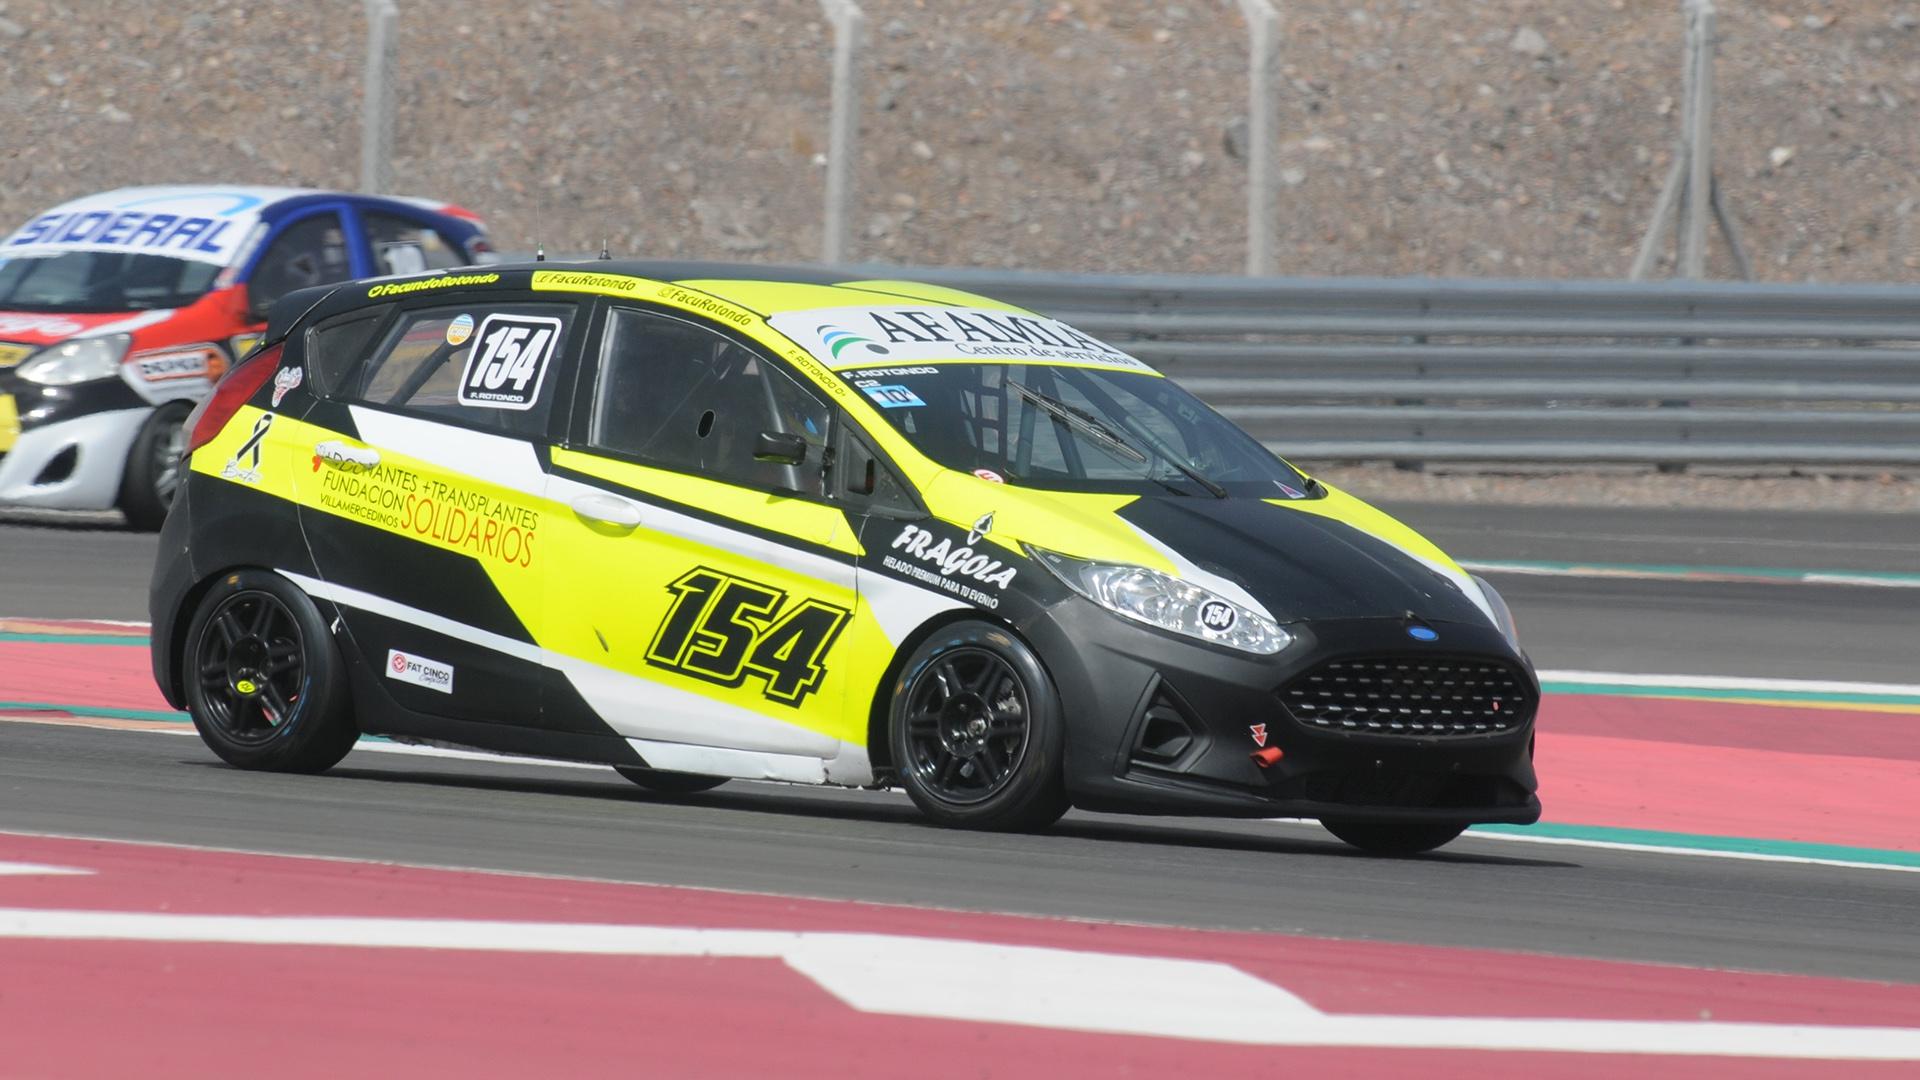 Segunda jornada de DG Motorsport en Alta Gracia